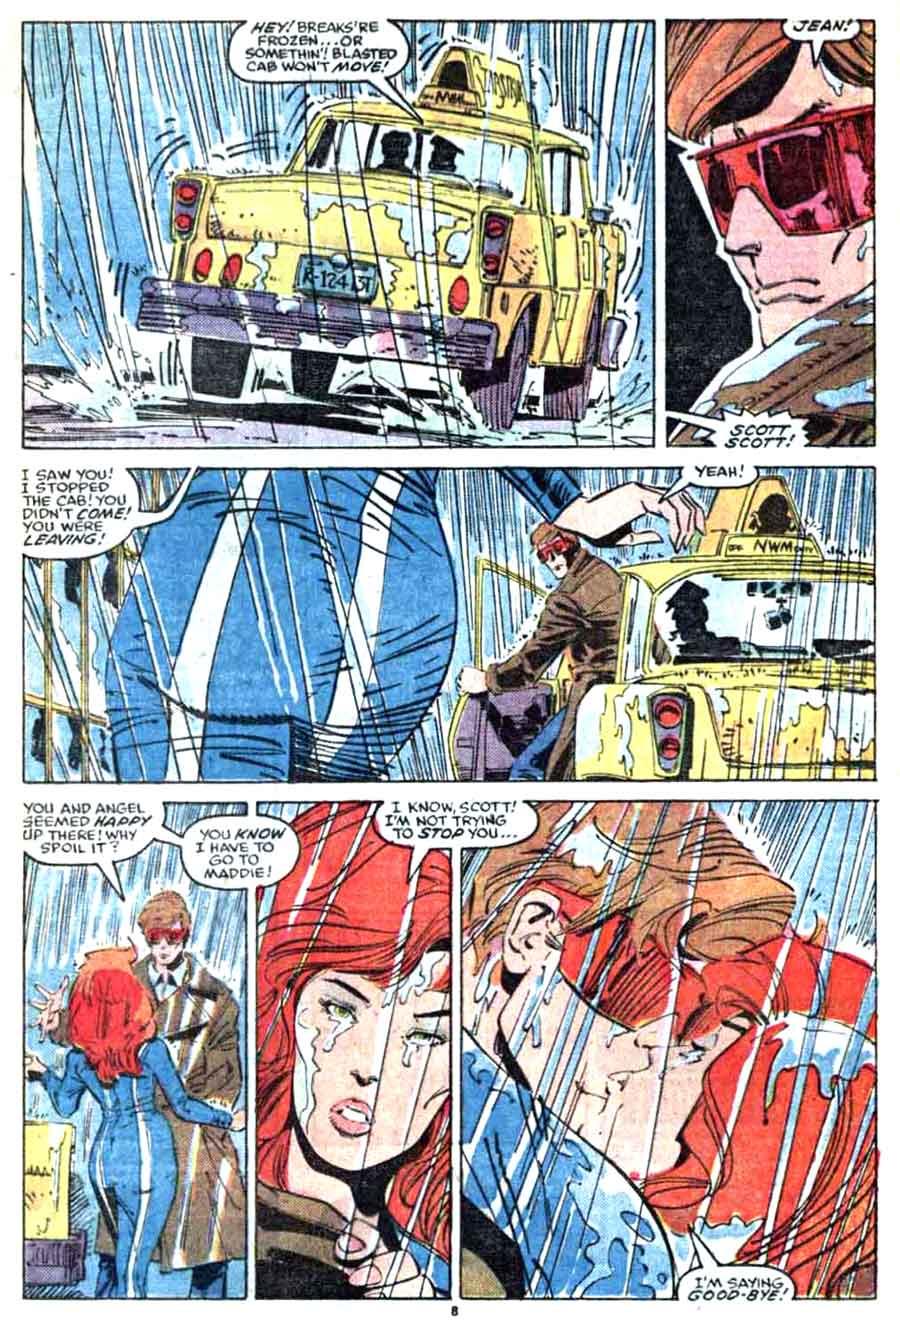 Walt Simonson jean grey marvel comic book page - X-Factor #13